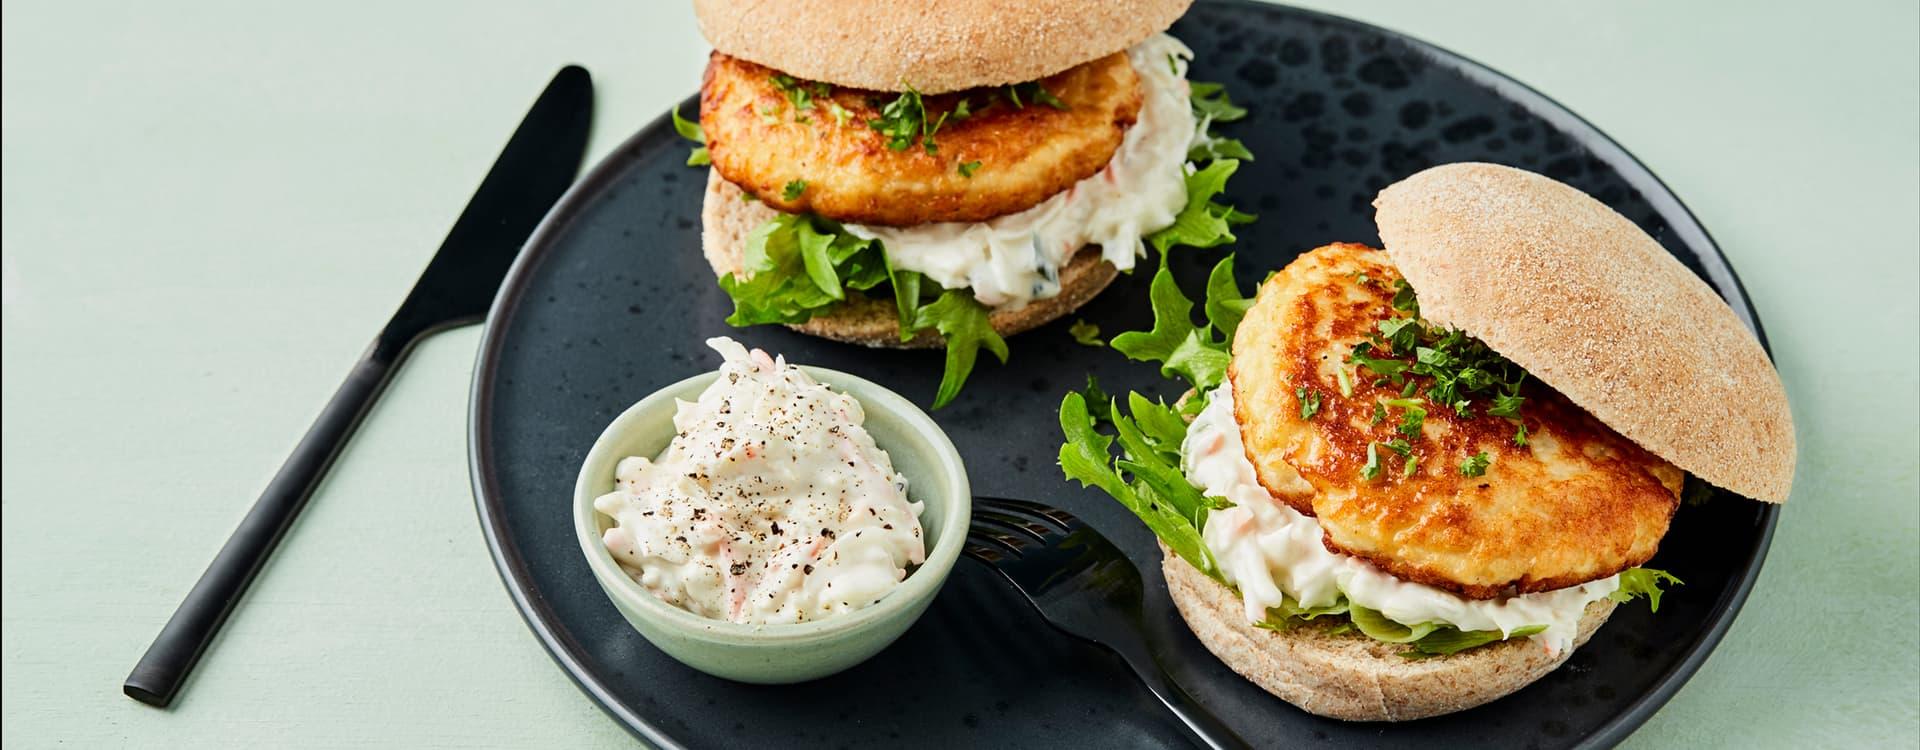 Fiskeburgere med crispysalat